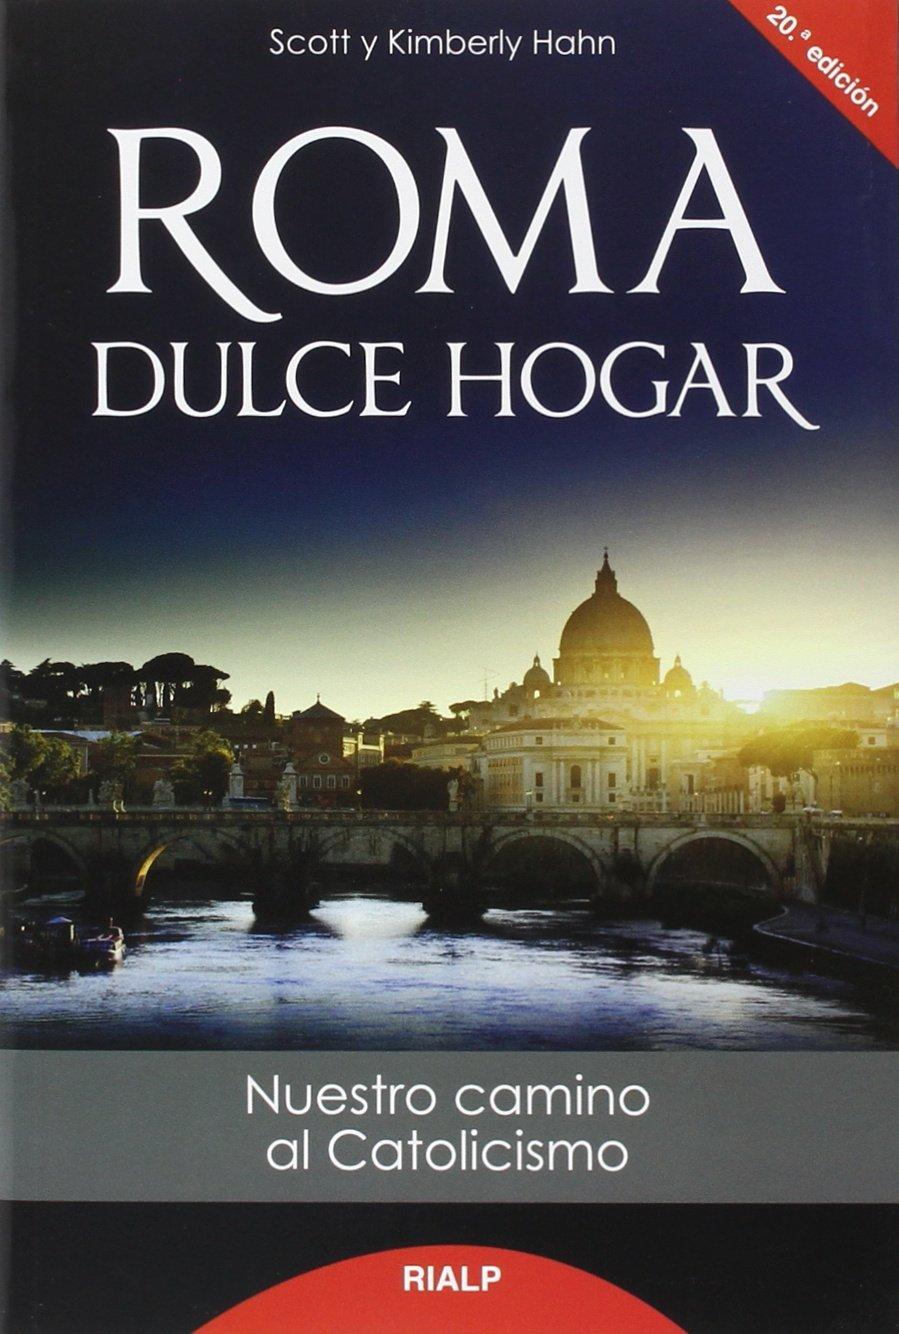 Roma Dulce Hogar (Spanish Edition) by Rialp